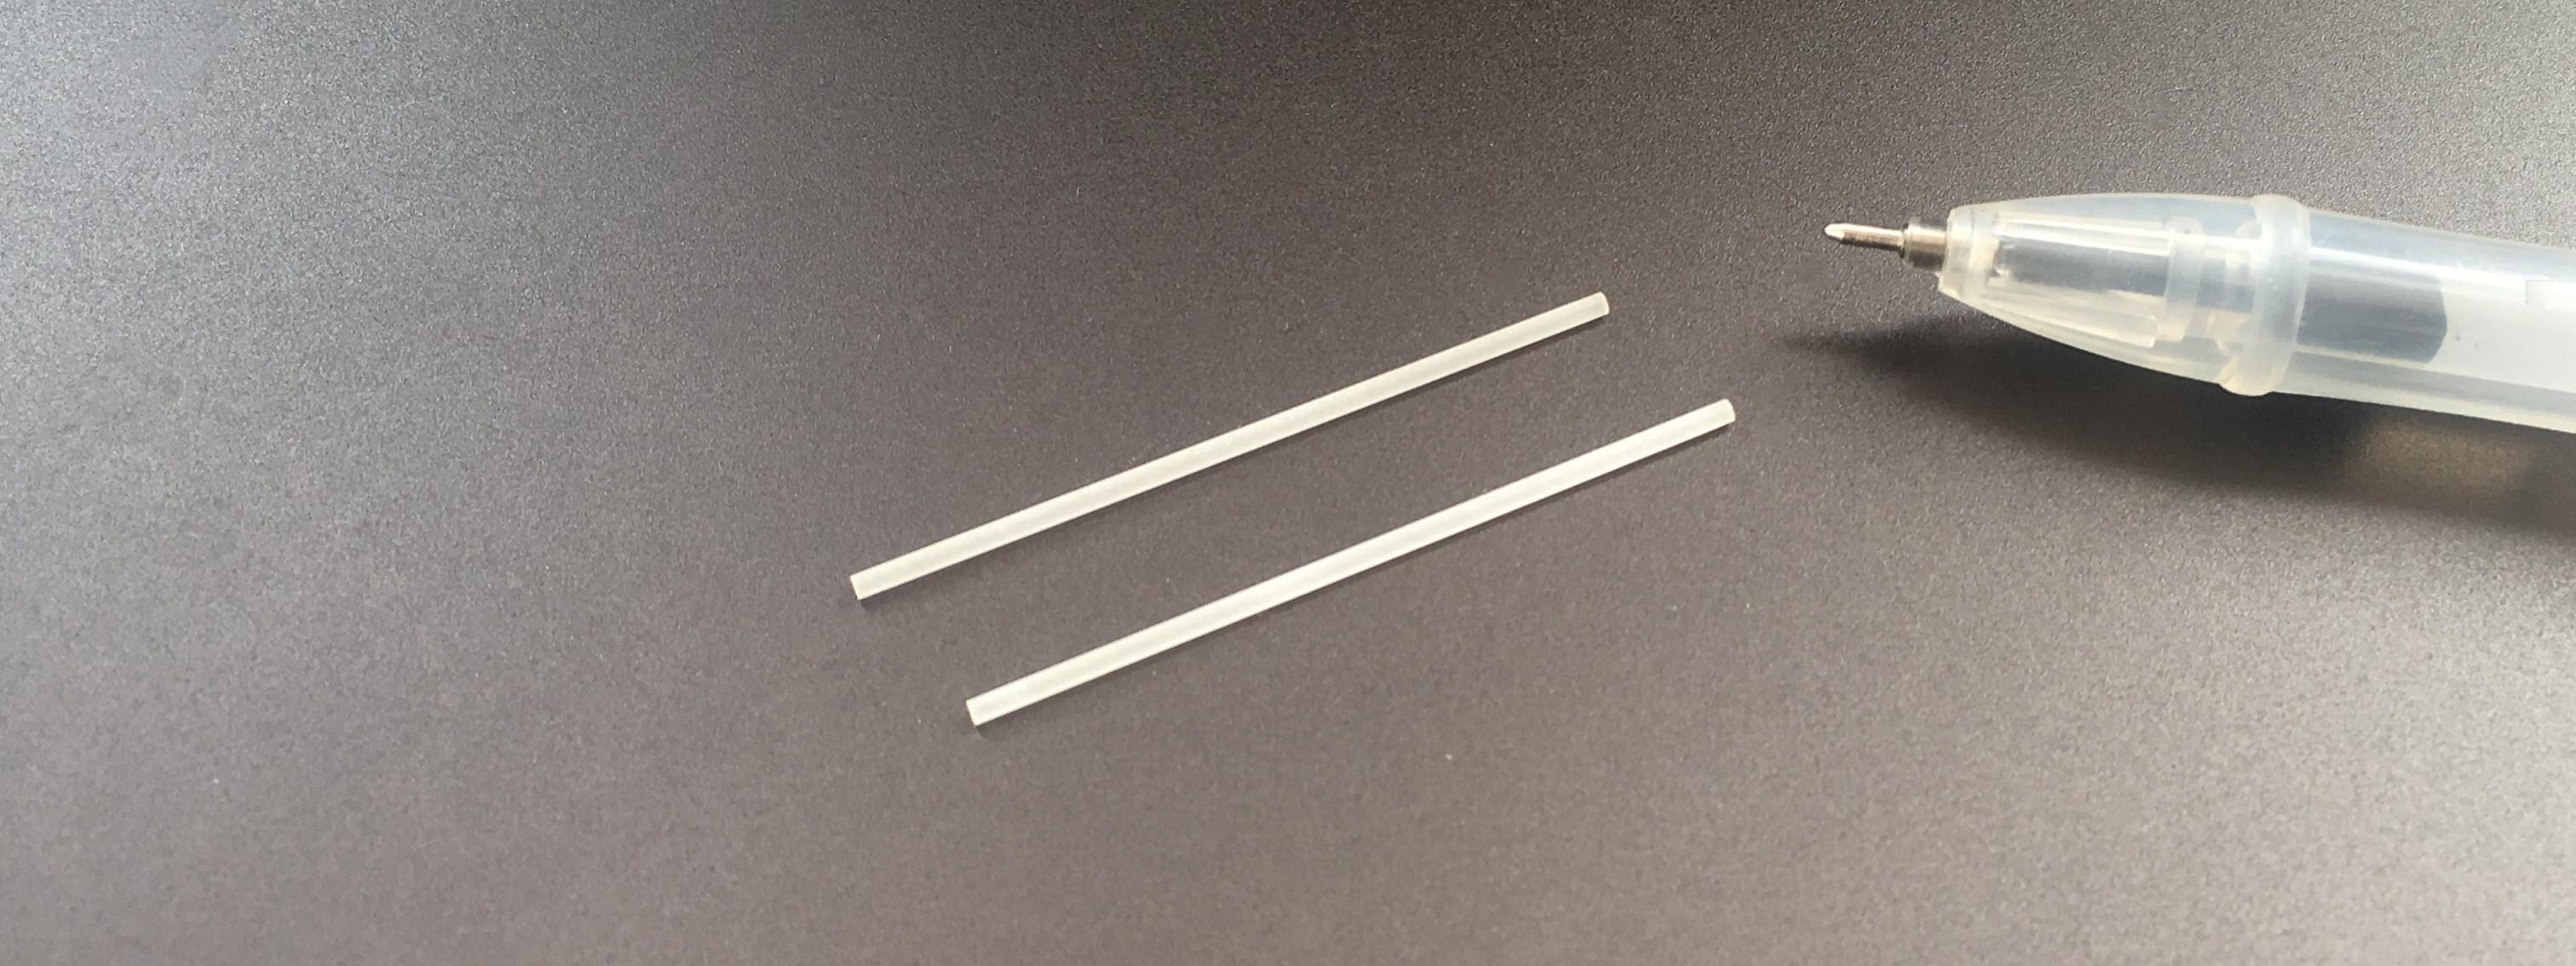 1*35mm sapphire rods